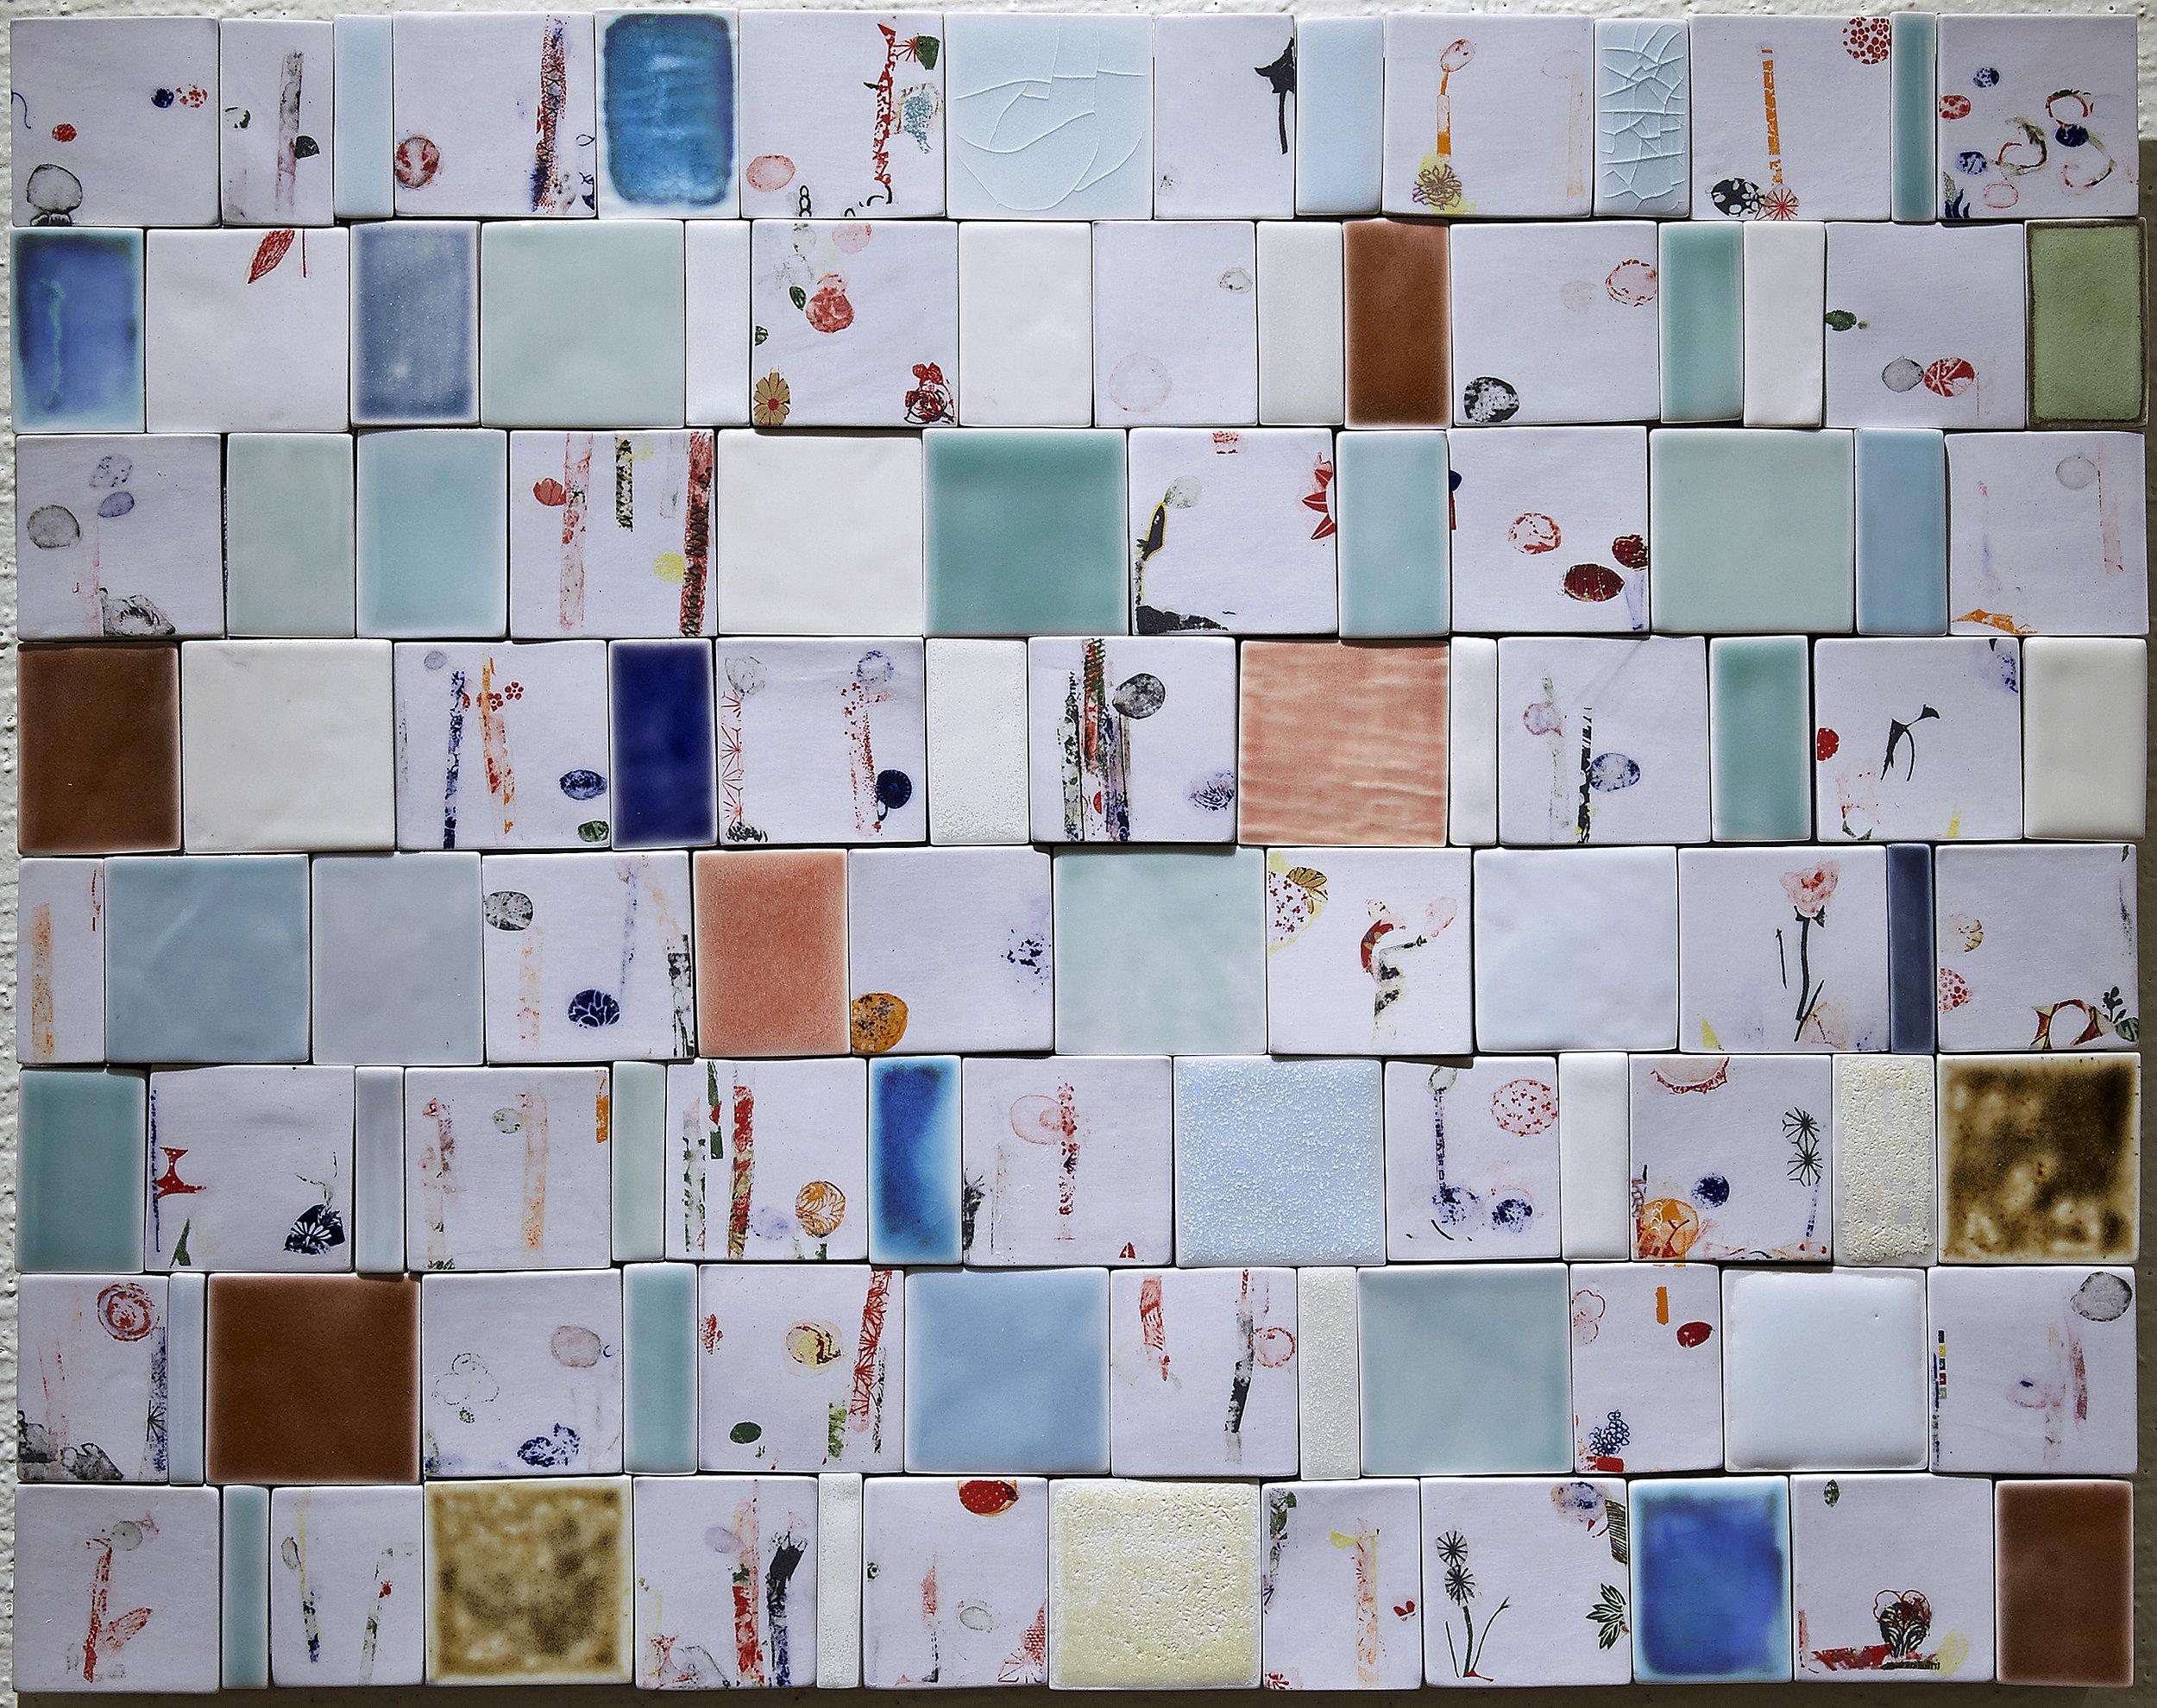 "<i>Fragments of Memory II</i>, 2016, porcelain, glaze, decal, h. 20 ½"" x w. 25 ½"""